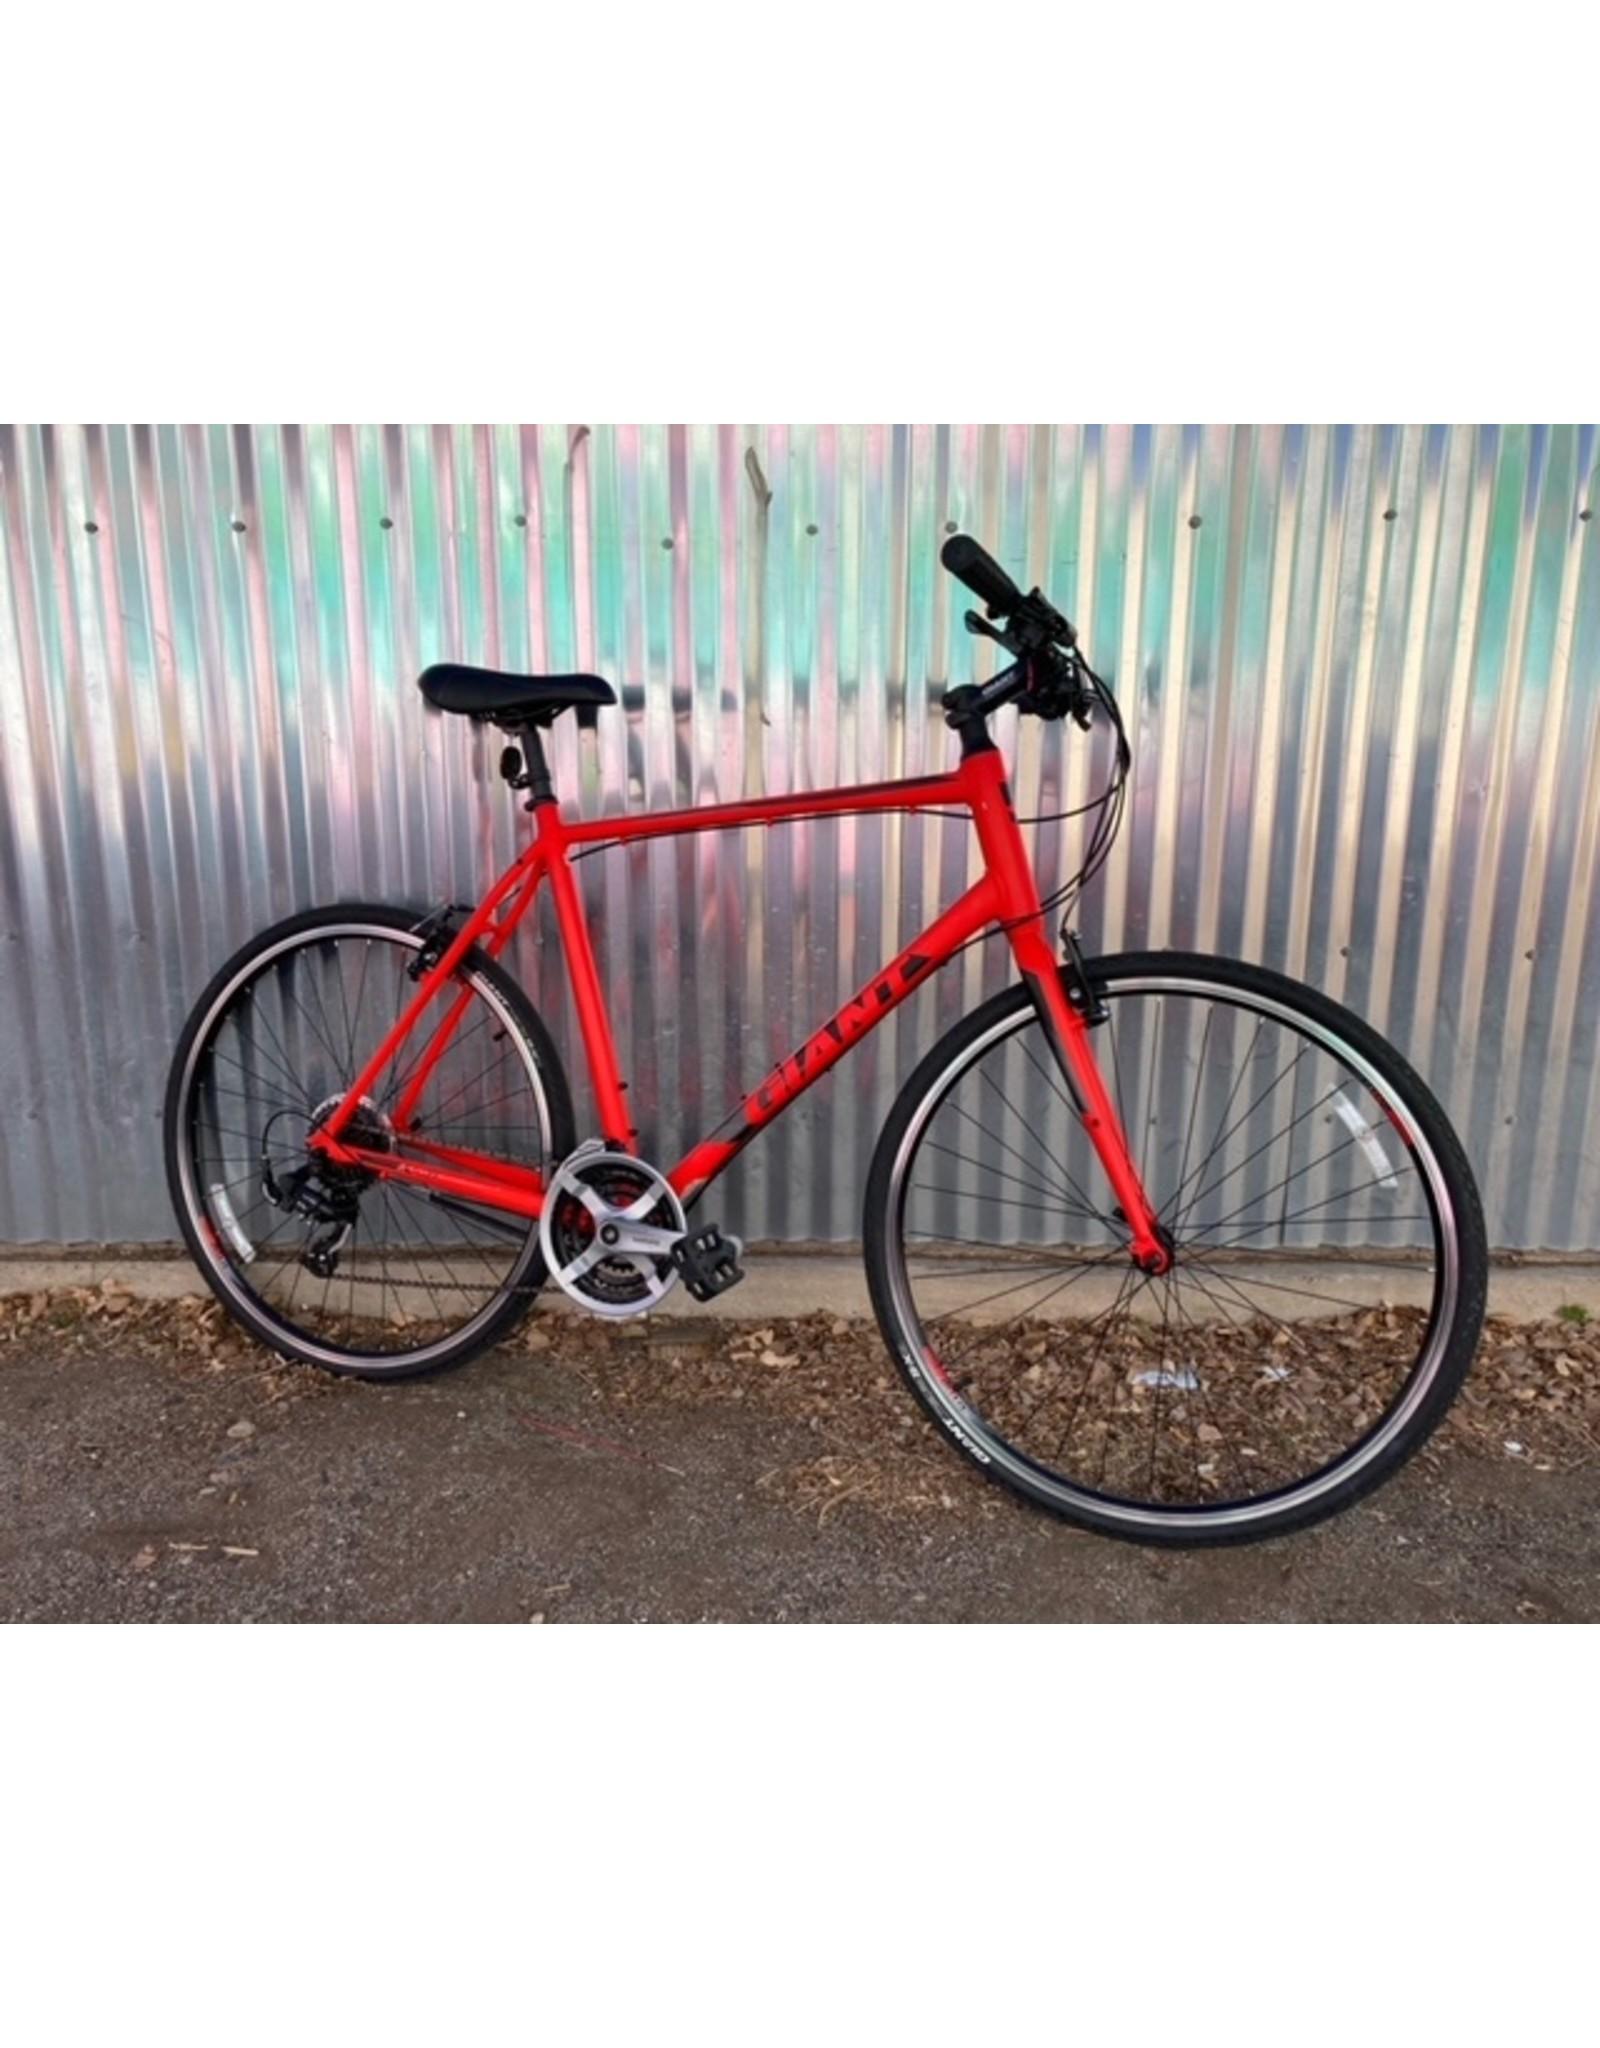 Used Bikes Used Bike 524 - XL Giant Escape